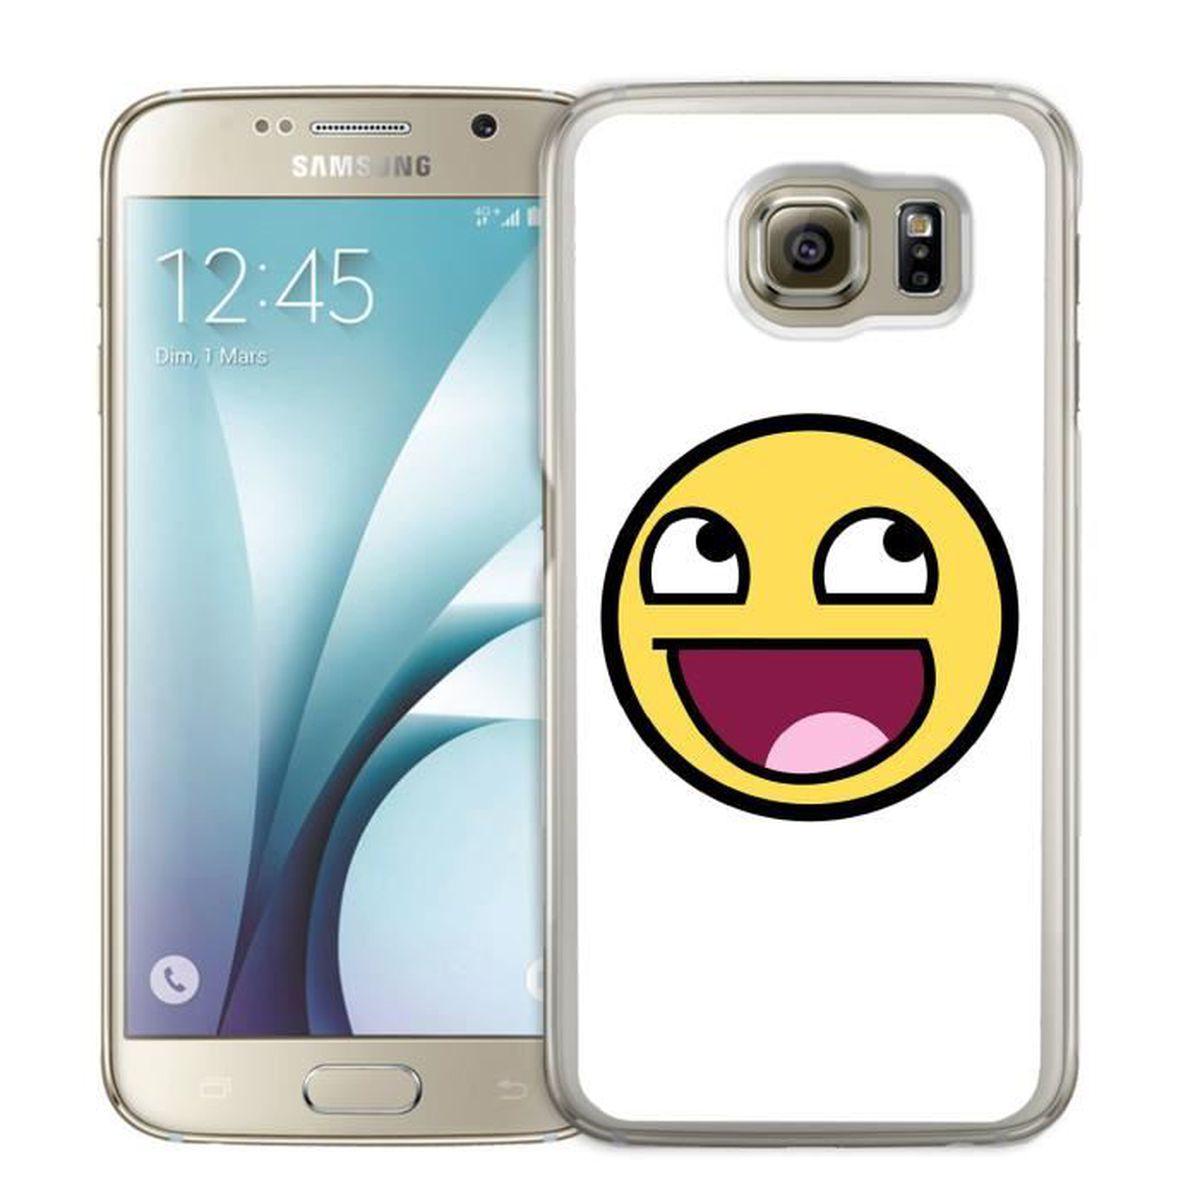 Coque Samsung Galaxy S4 Mini : Smiley - Cdiscount Téléphonie